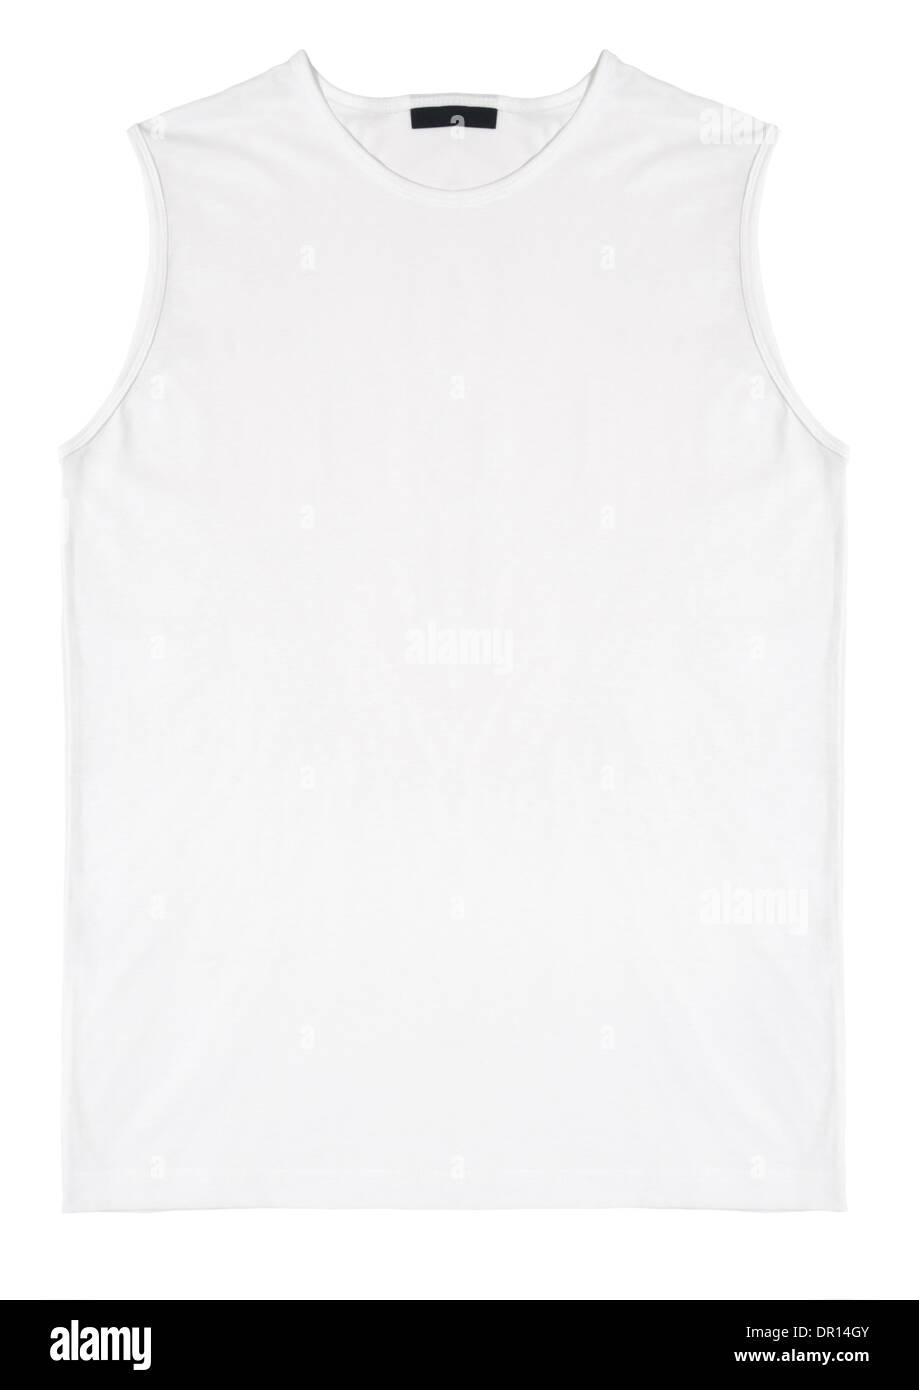 Camiseta sin mangas blanca sobre fondo blanco. Imagen De Stock